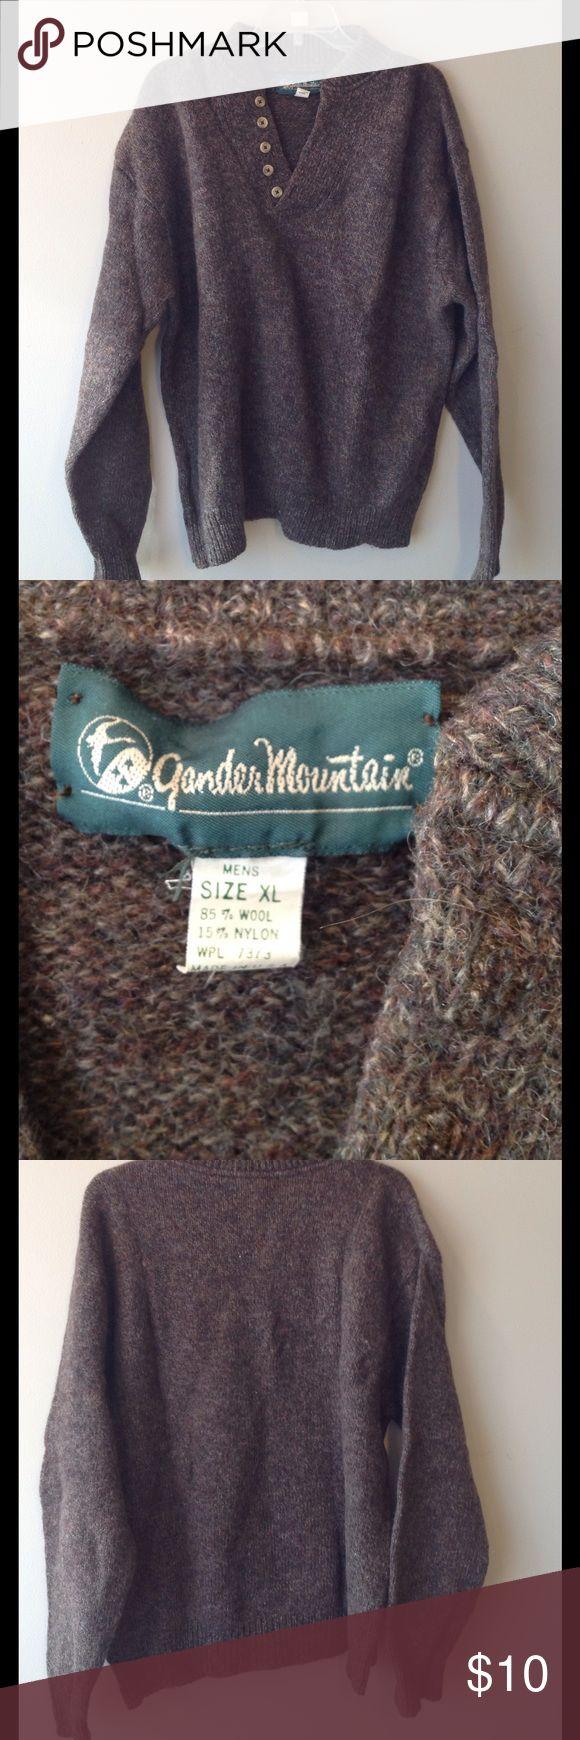 Men's Gander Mountain XL Wool sweater Brown Men's XL wool sweater By Gander Mountain in brown. Gander Mountain Sweaters V-Neck